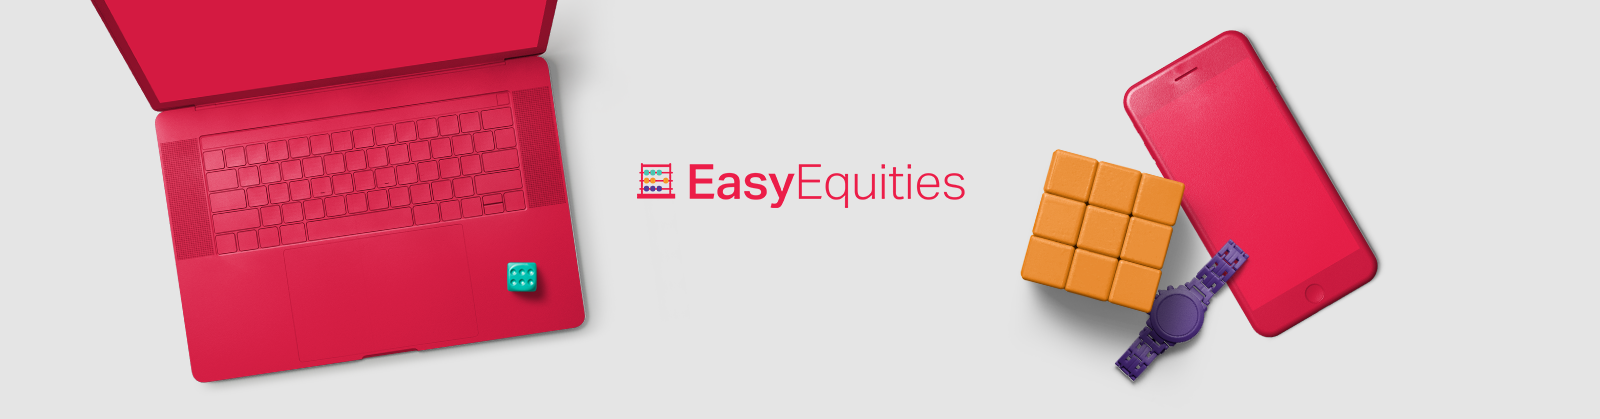 Easy-Equities-Header-Banner.png